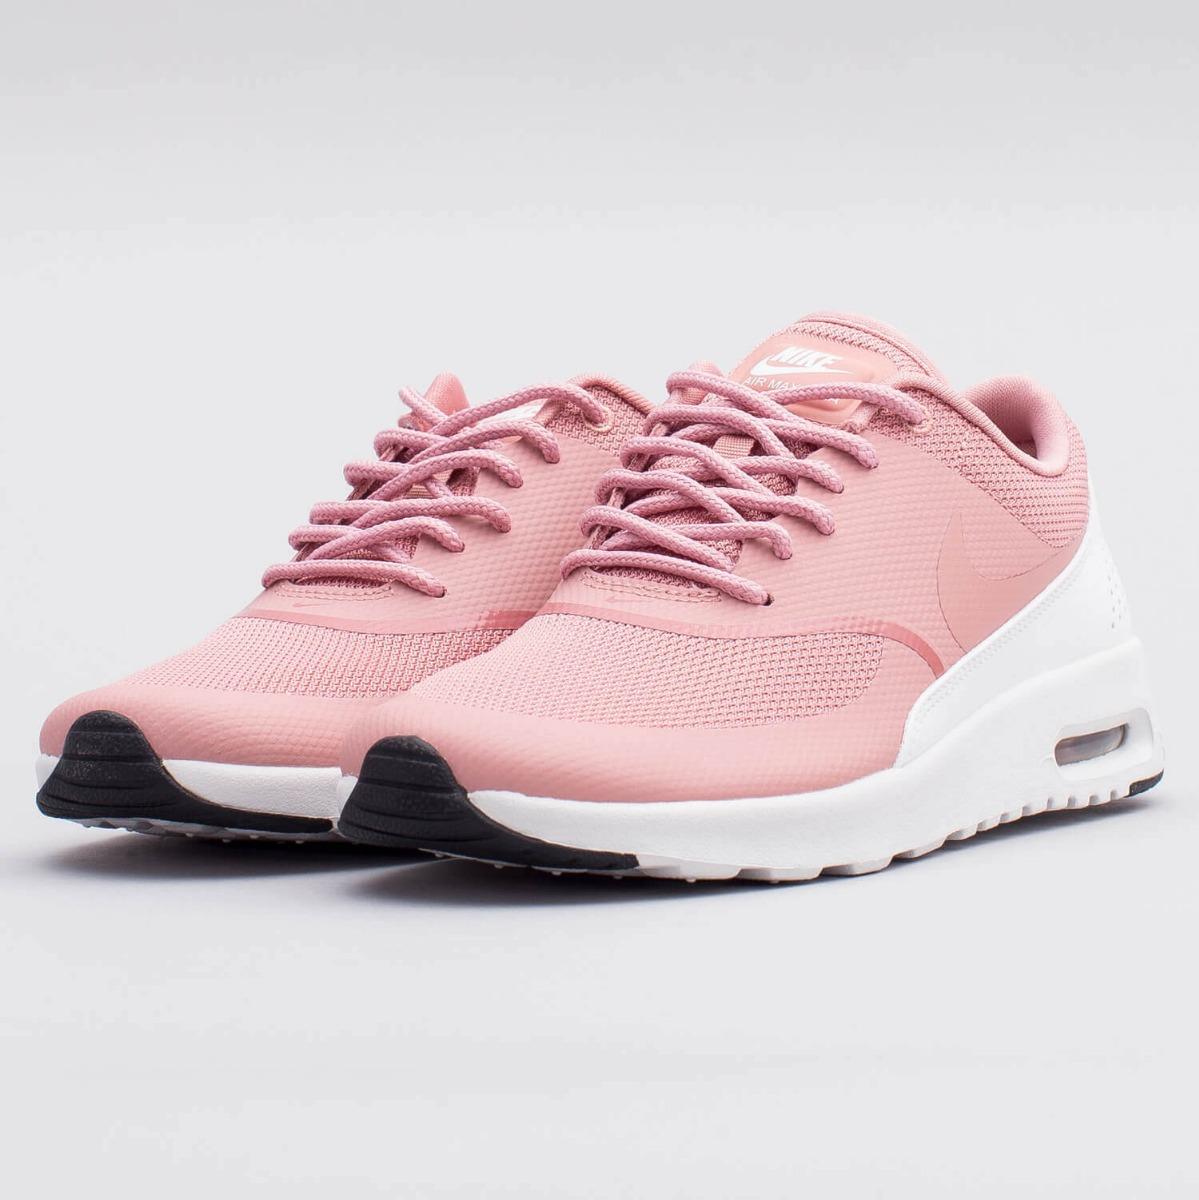 01b5d688ae Nike Air Max Dama (nuevos 100% Originales Garantizados) - $ 1,659.00 ...